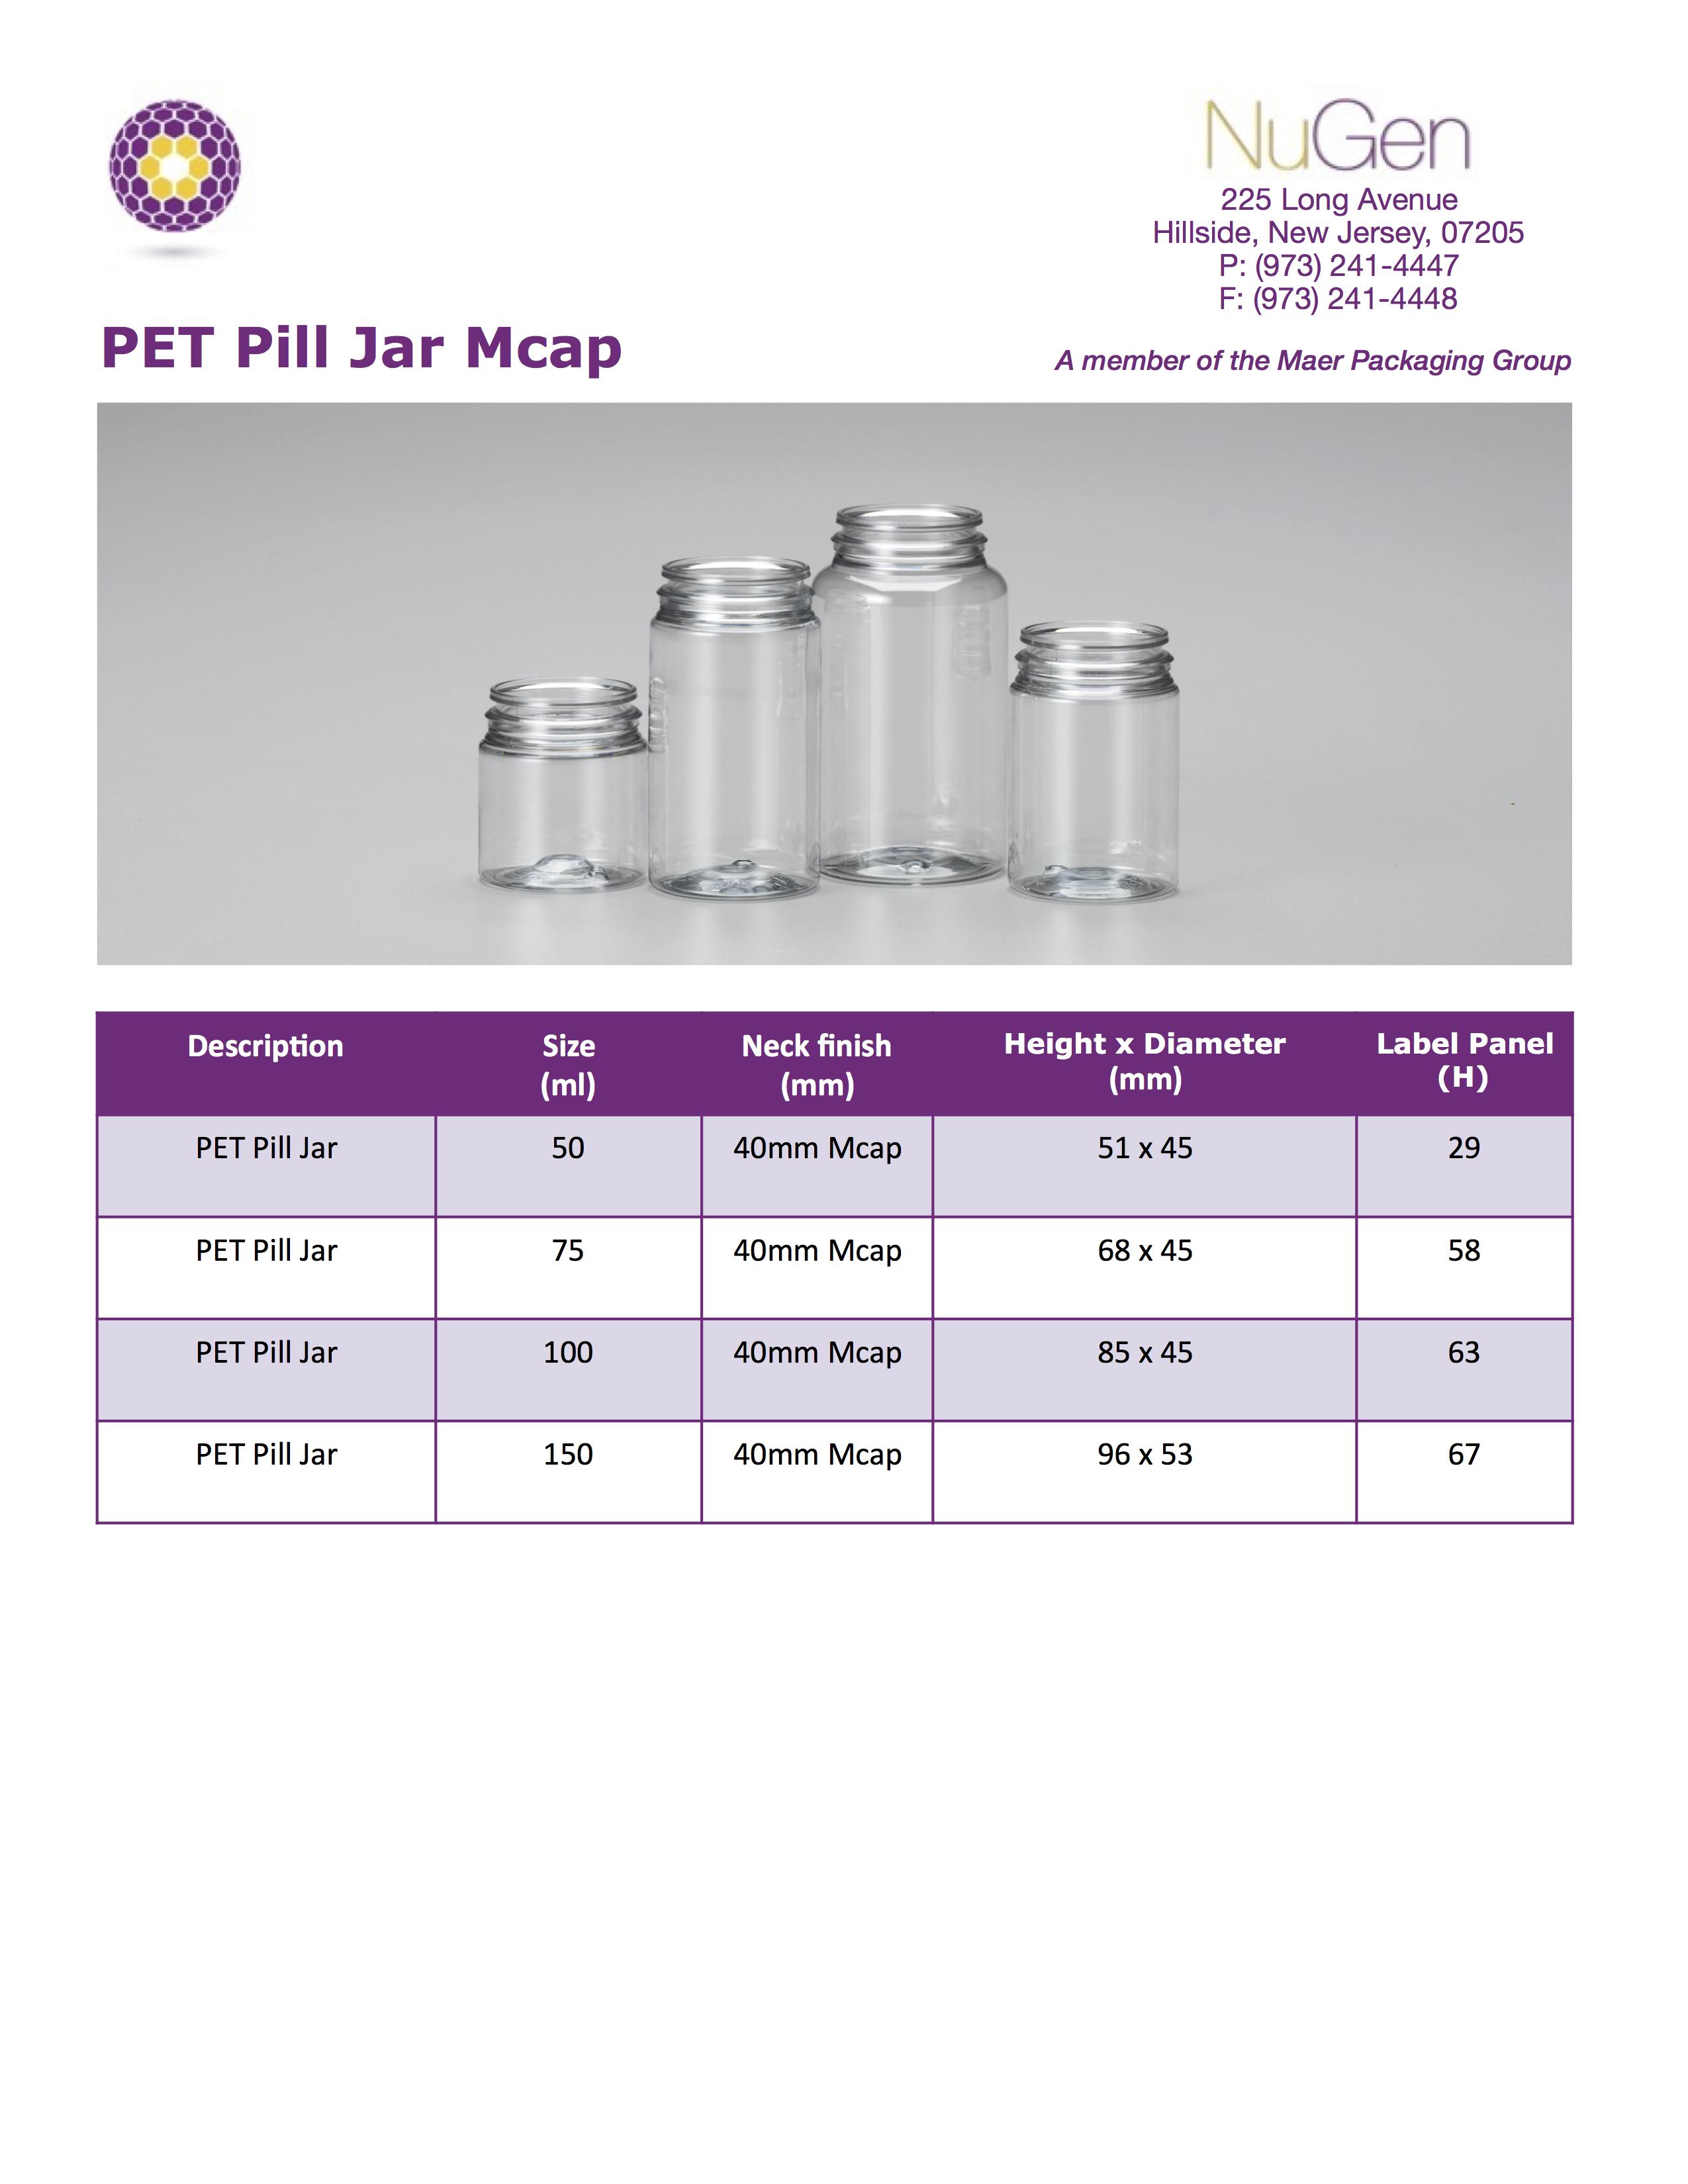 PETPillJarMcap-4-4-2016.jpg